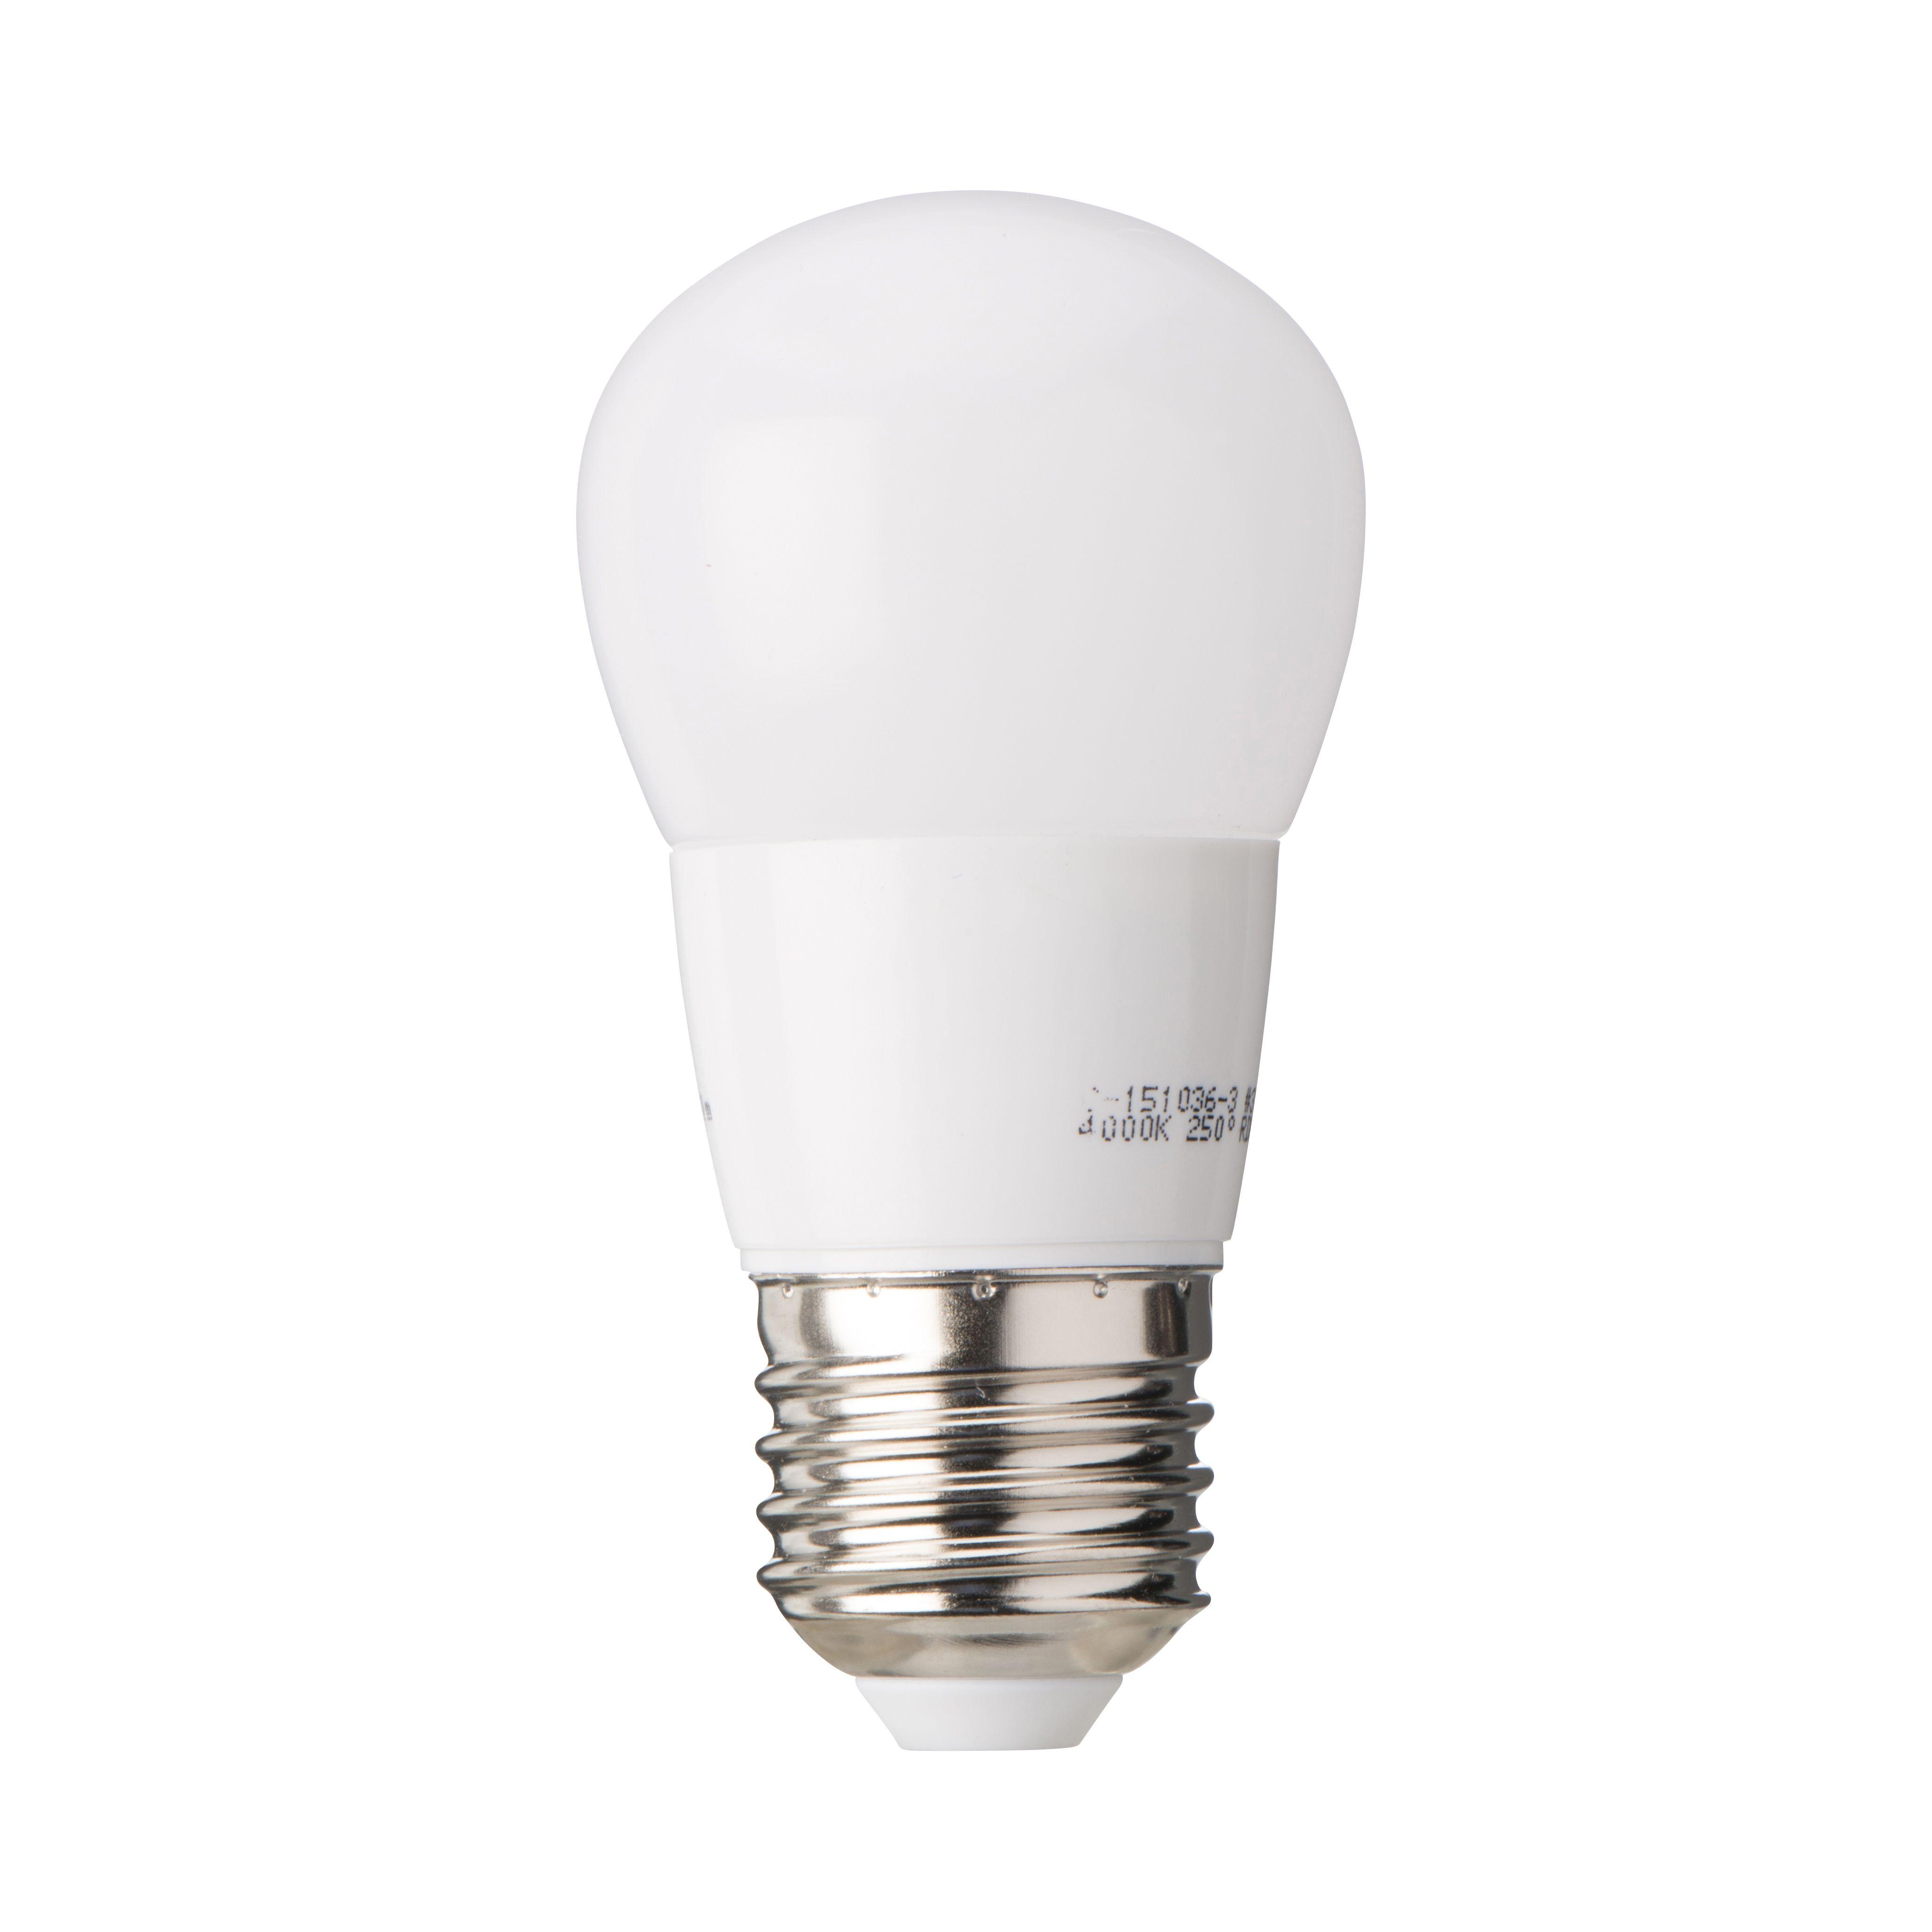 Diall E27 250lm LED Ball Light Bulb | Departments